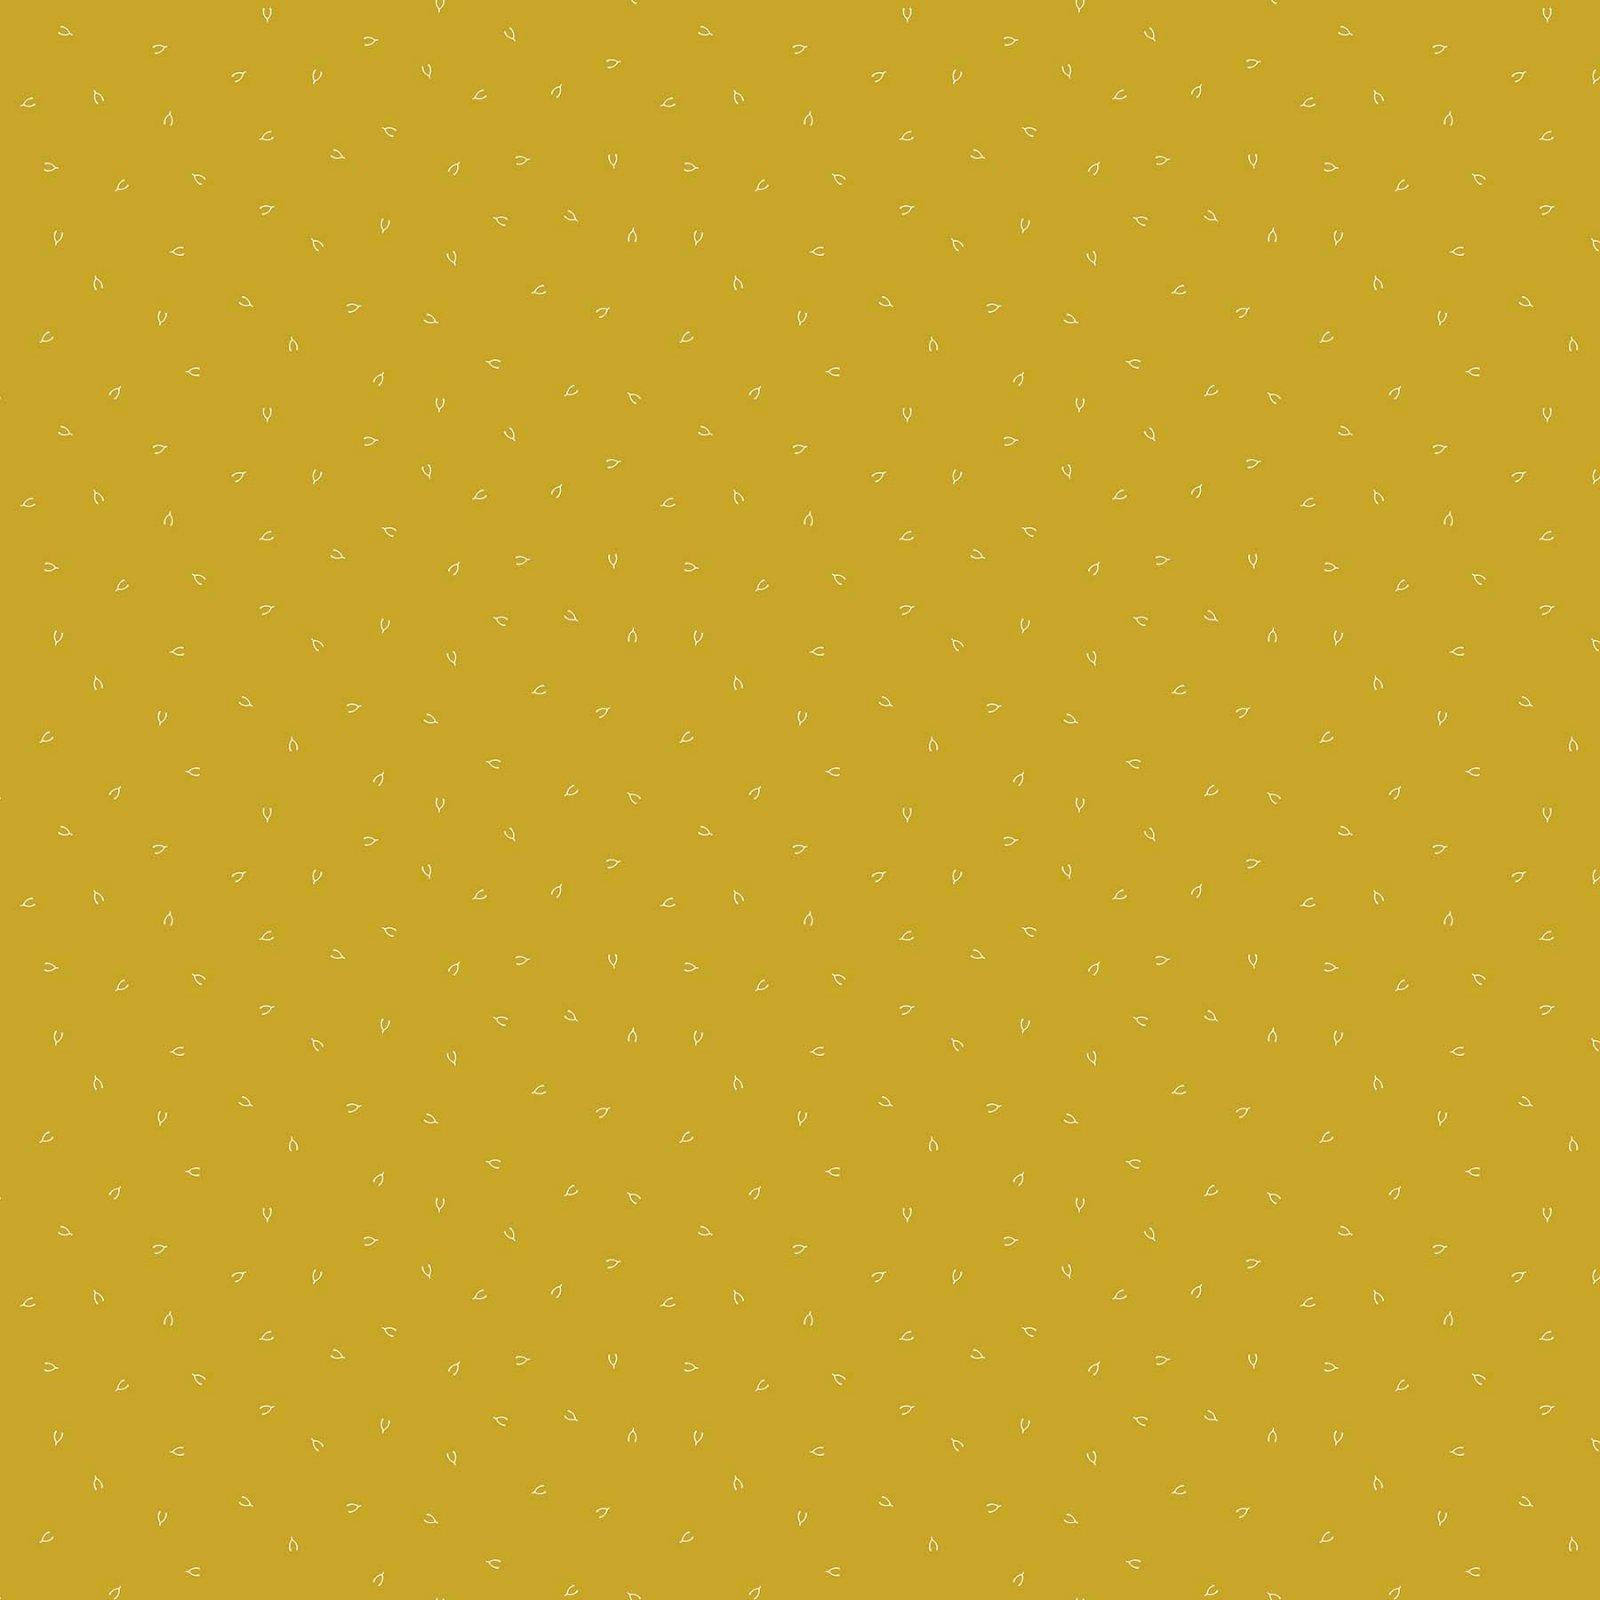 Lucky Charms Basics by Figo 92000 53 Mustard Wishbones